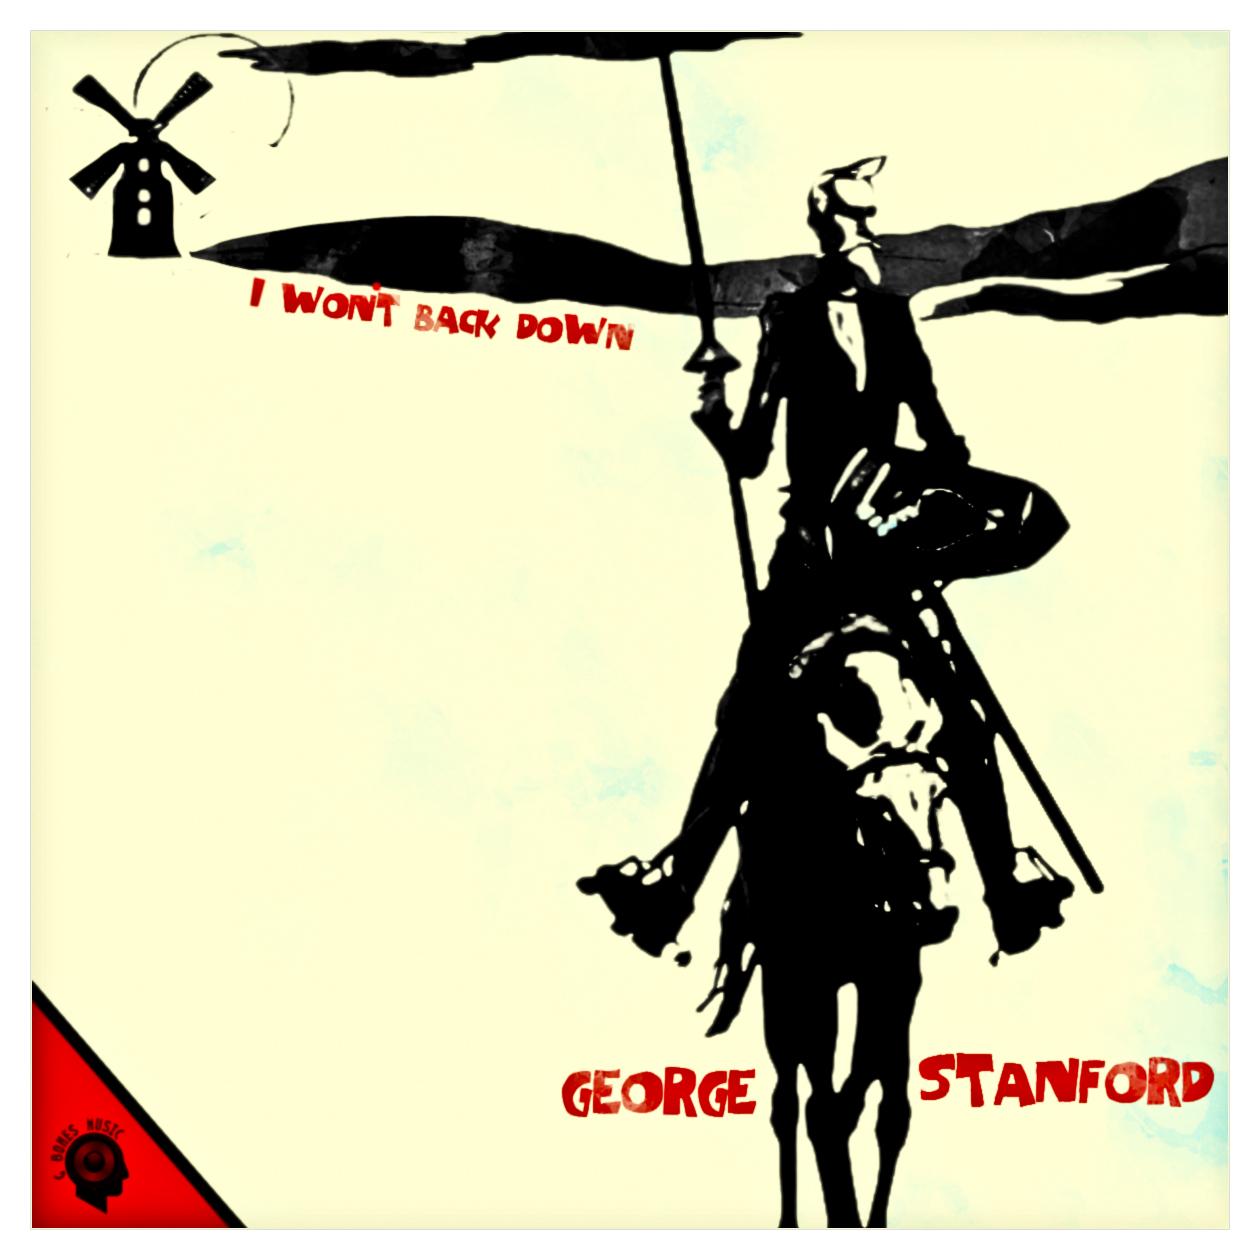 1965 SERGIO LEONE STYLE W B D COVER.jpg